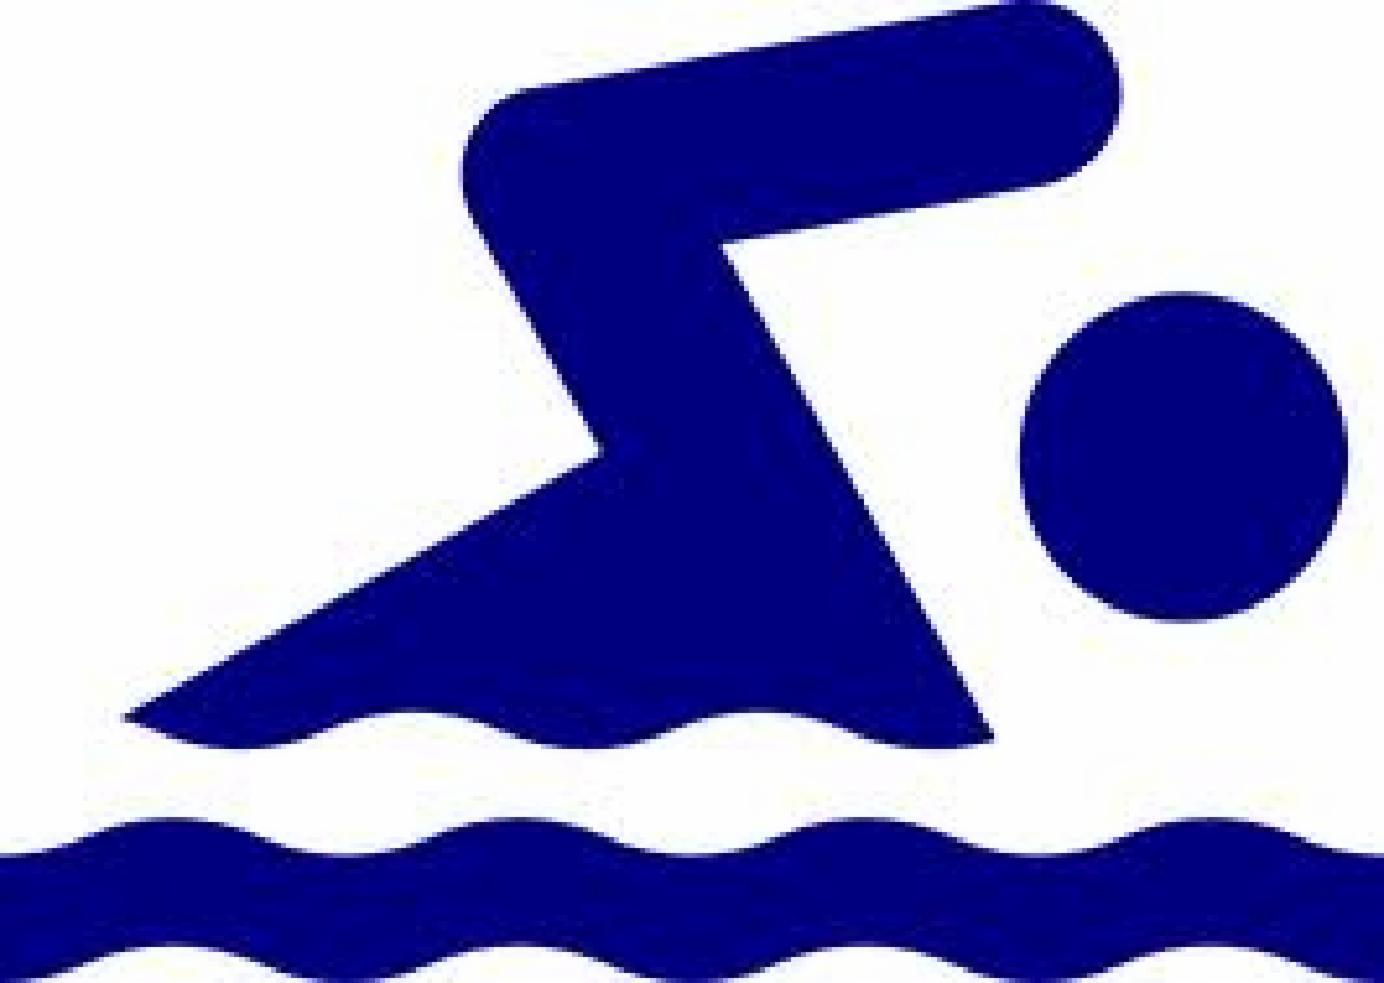 st thomas leesfield c of e primary school swimming rh leesfield oldham sch uk swim logos graphics swim logo art